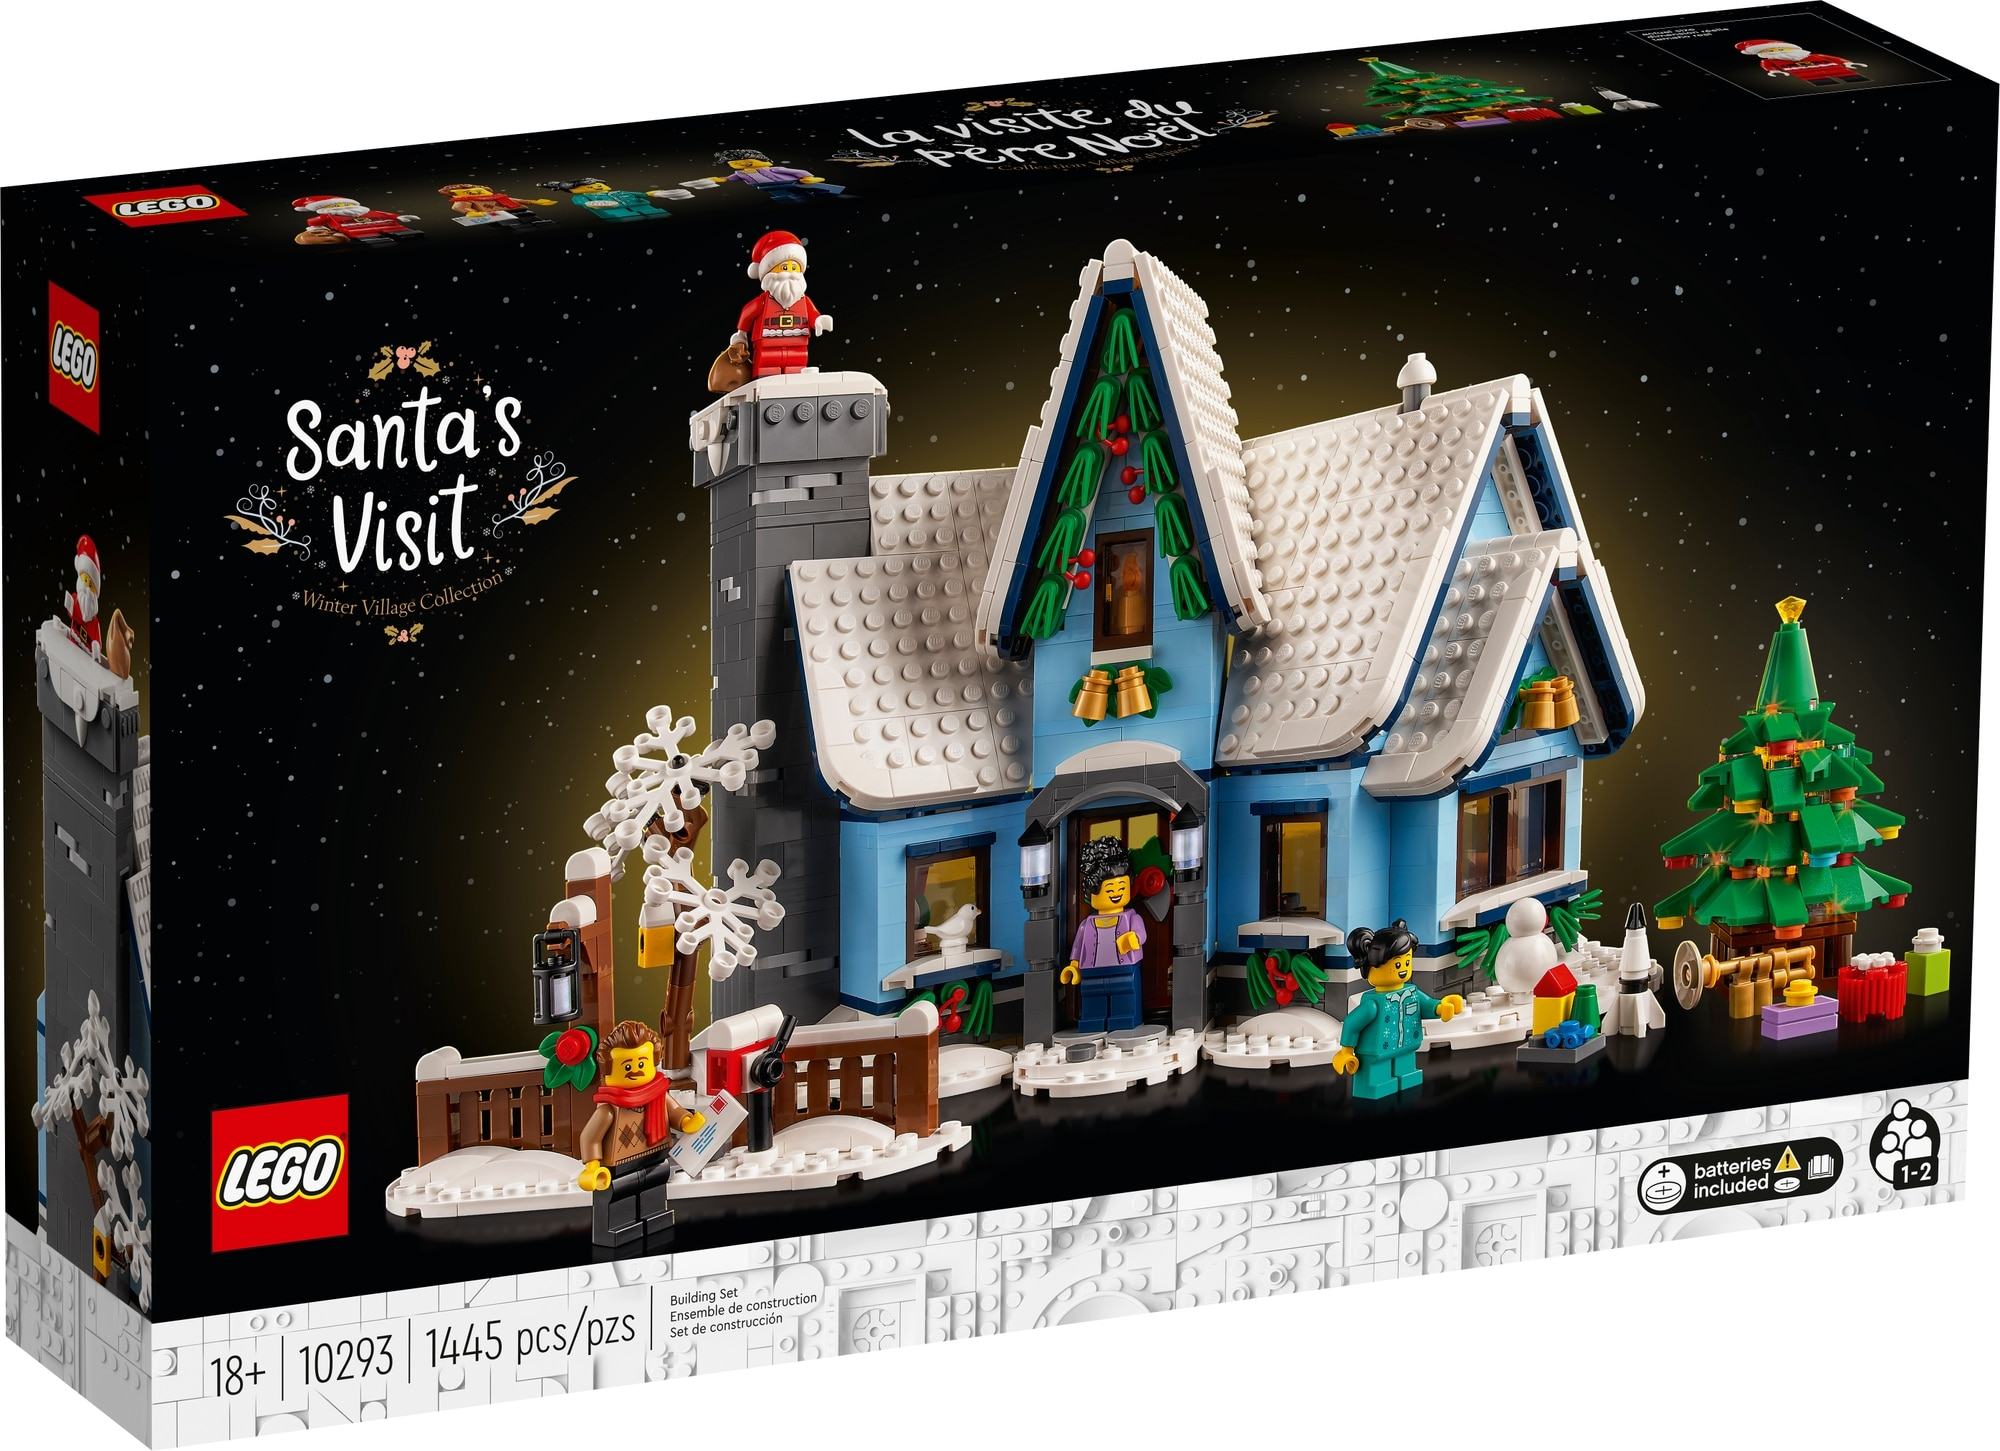 LEGO Creator Expert 10293 Santas Visit 2